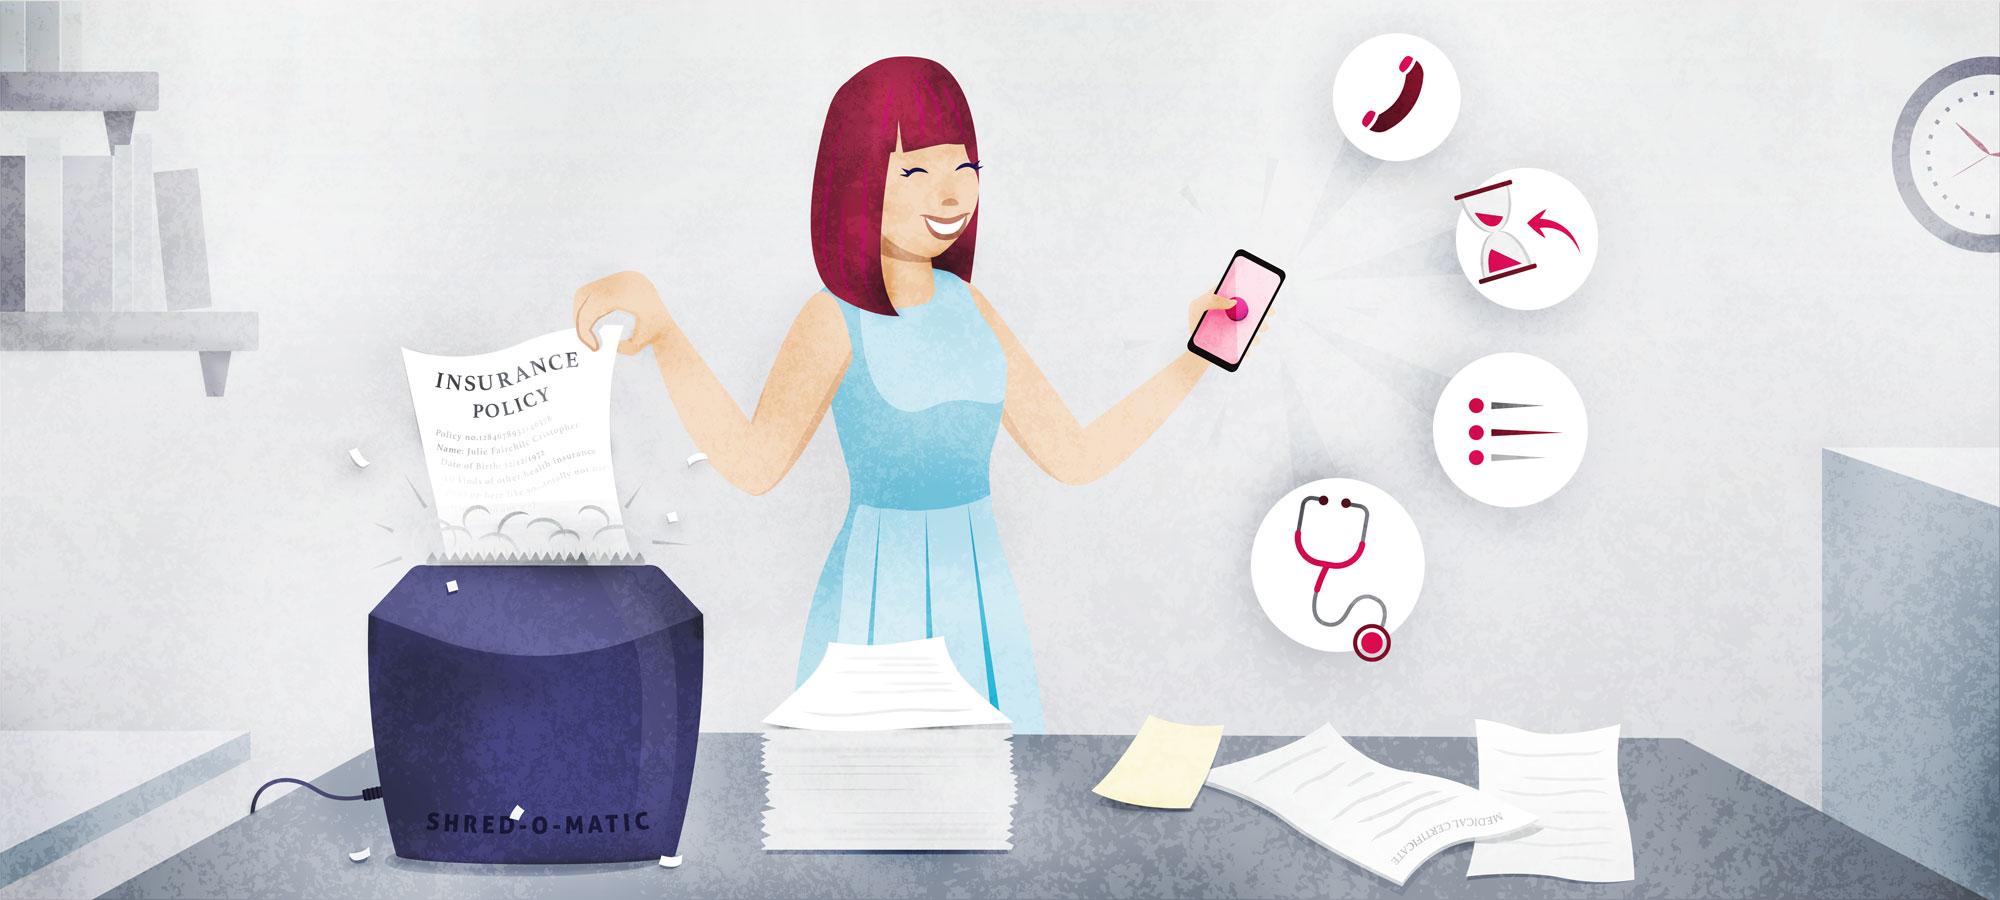 HealthXL-Blog-Illustrations-OP-1.jpg